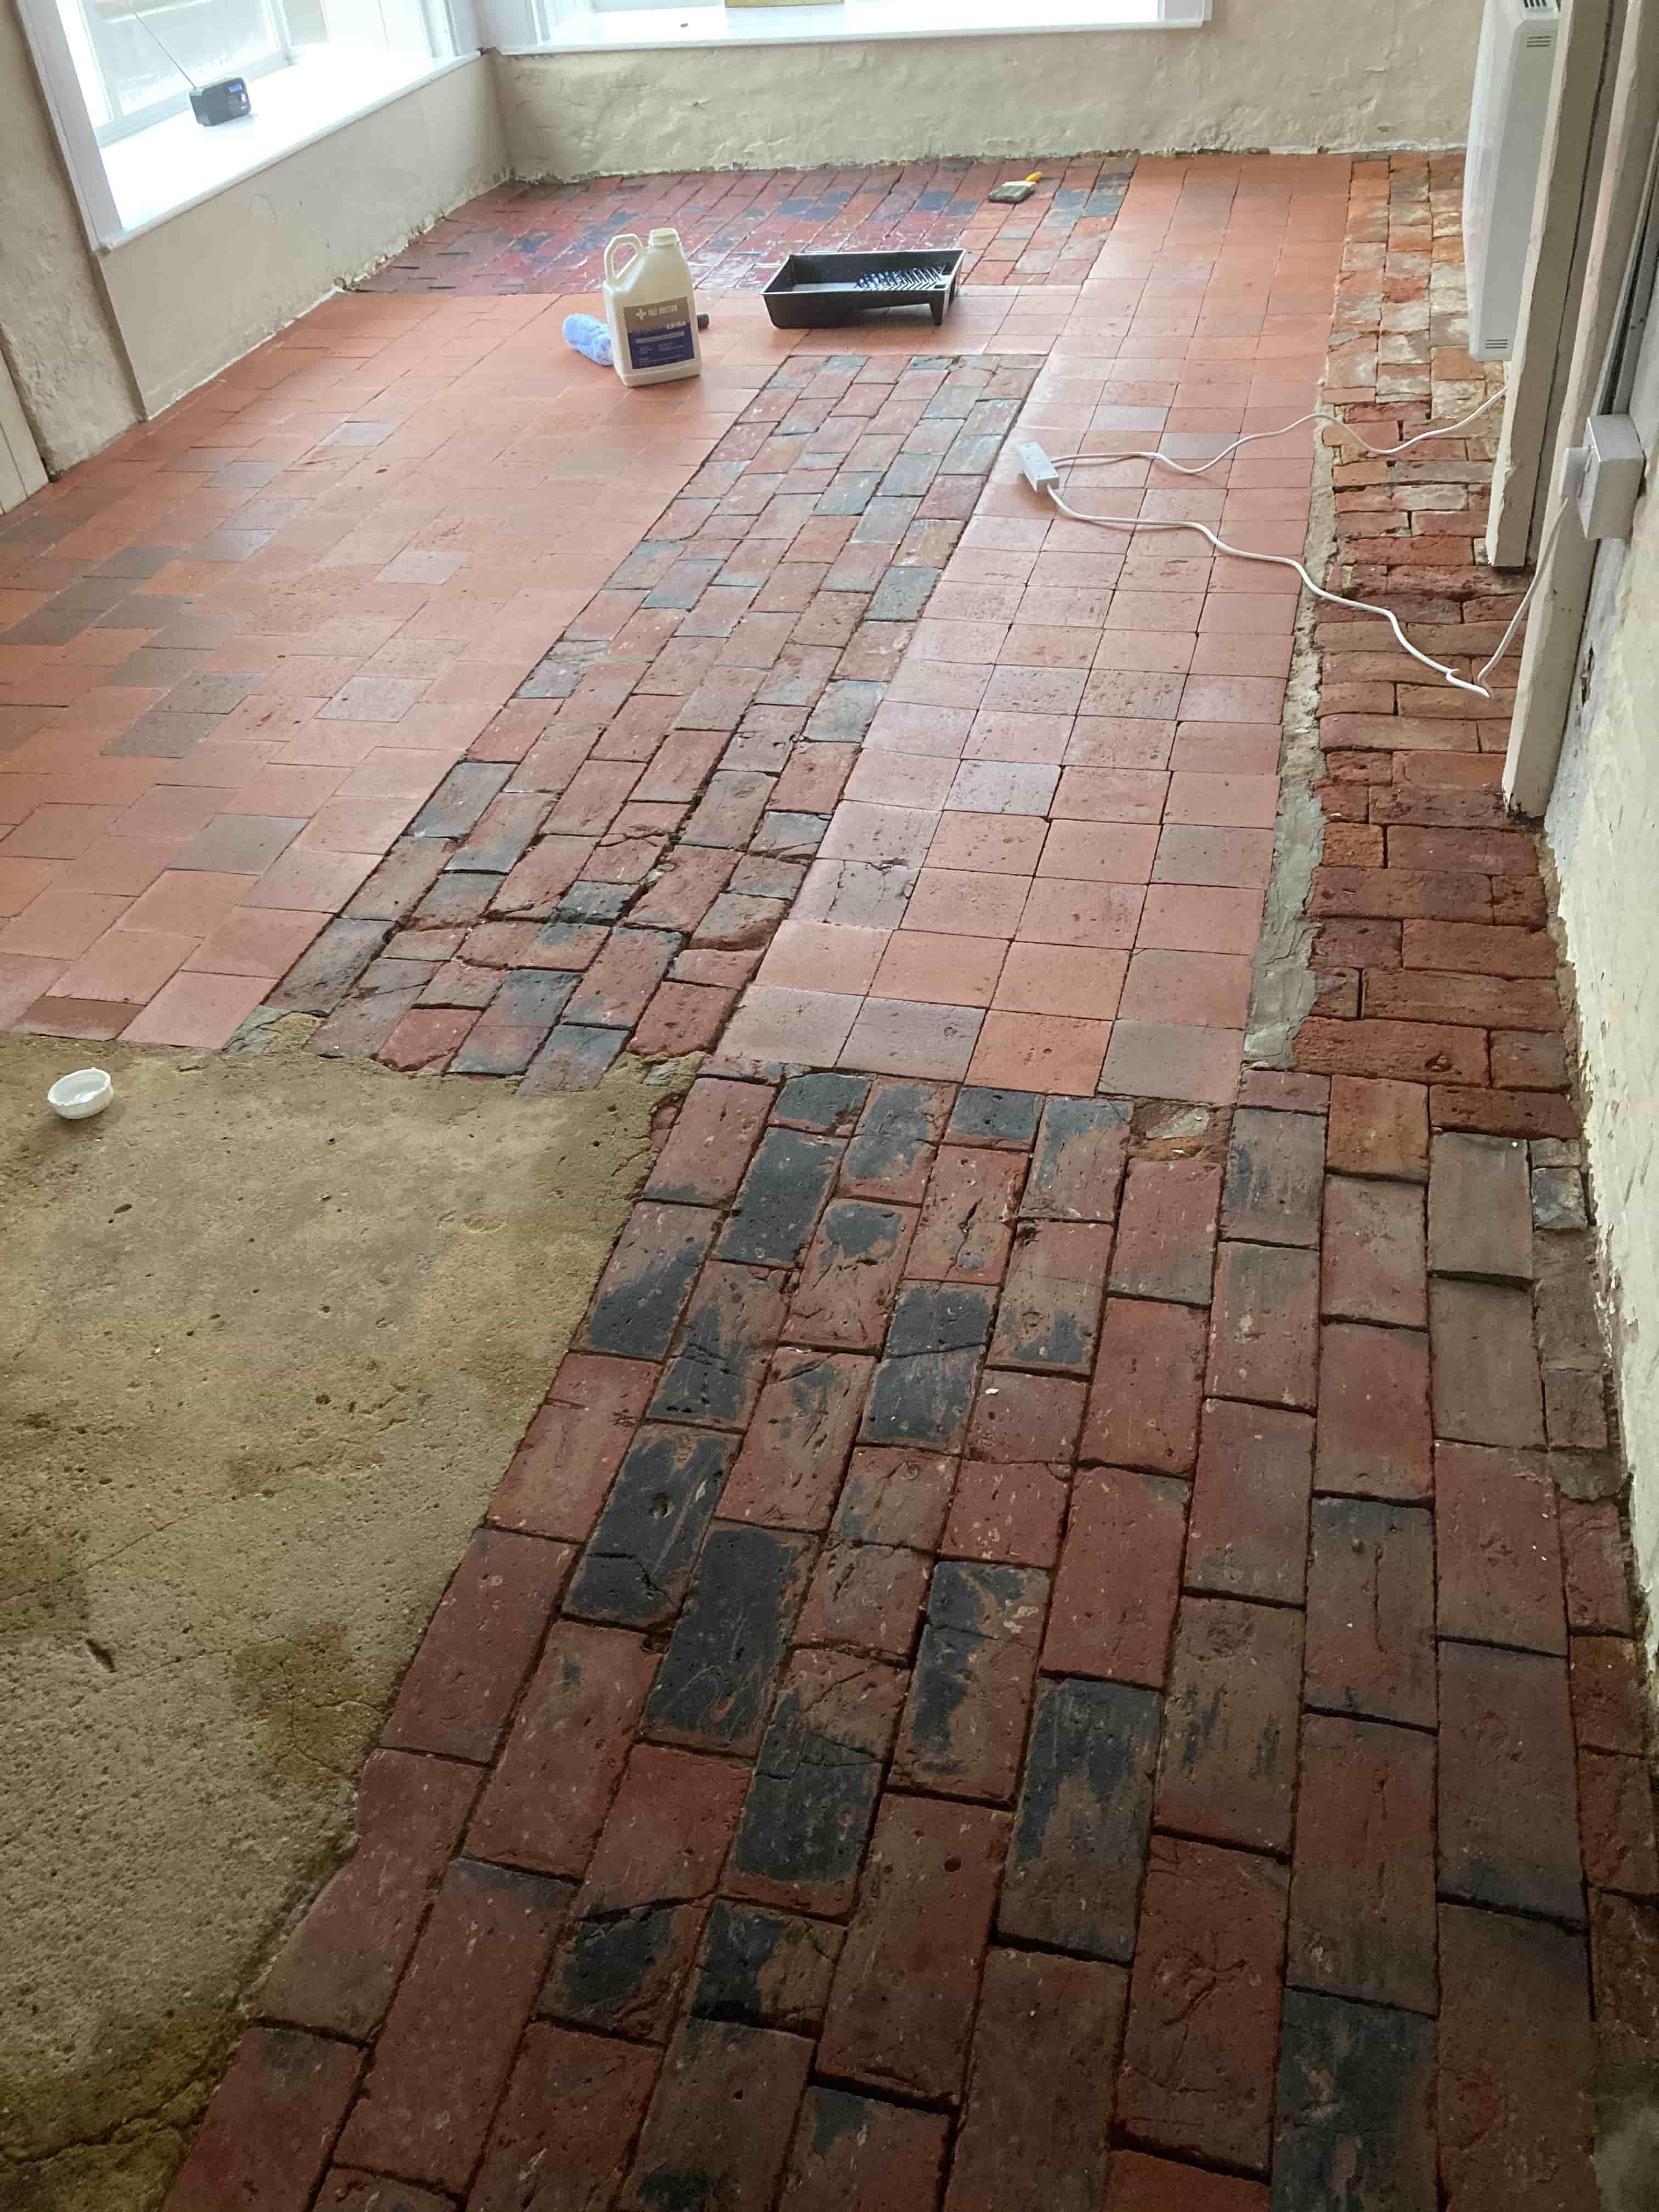 Brick Quarry Floor During Renovation Royal Tunbridge Wells